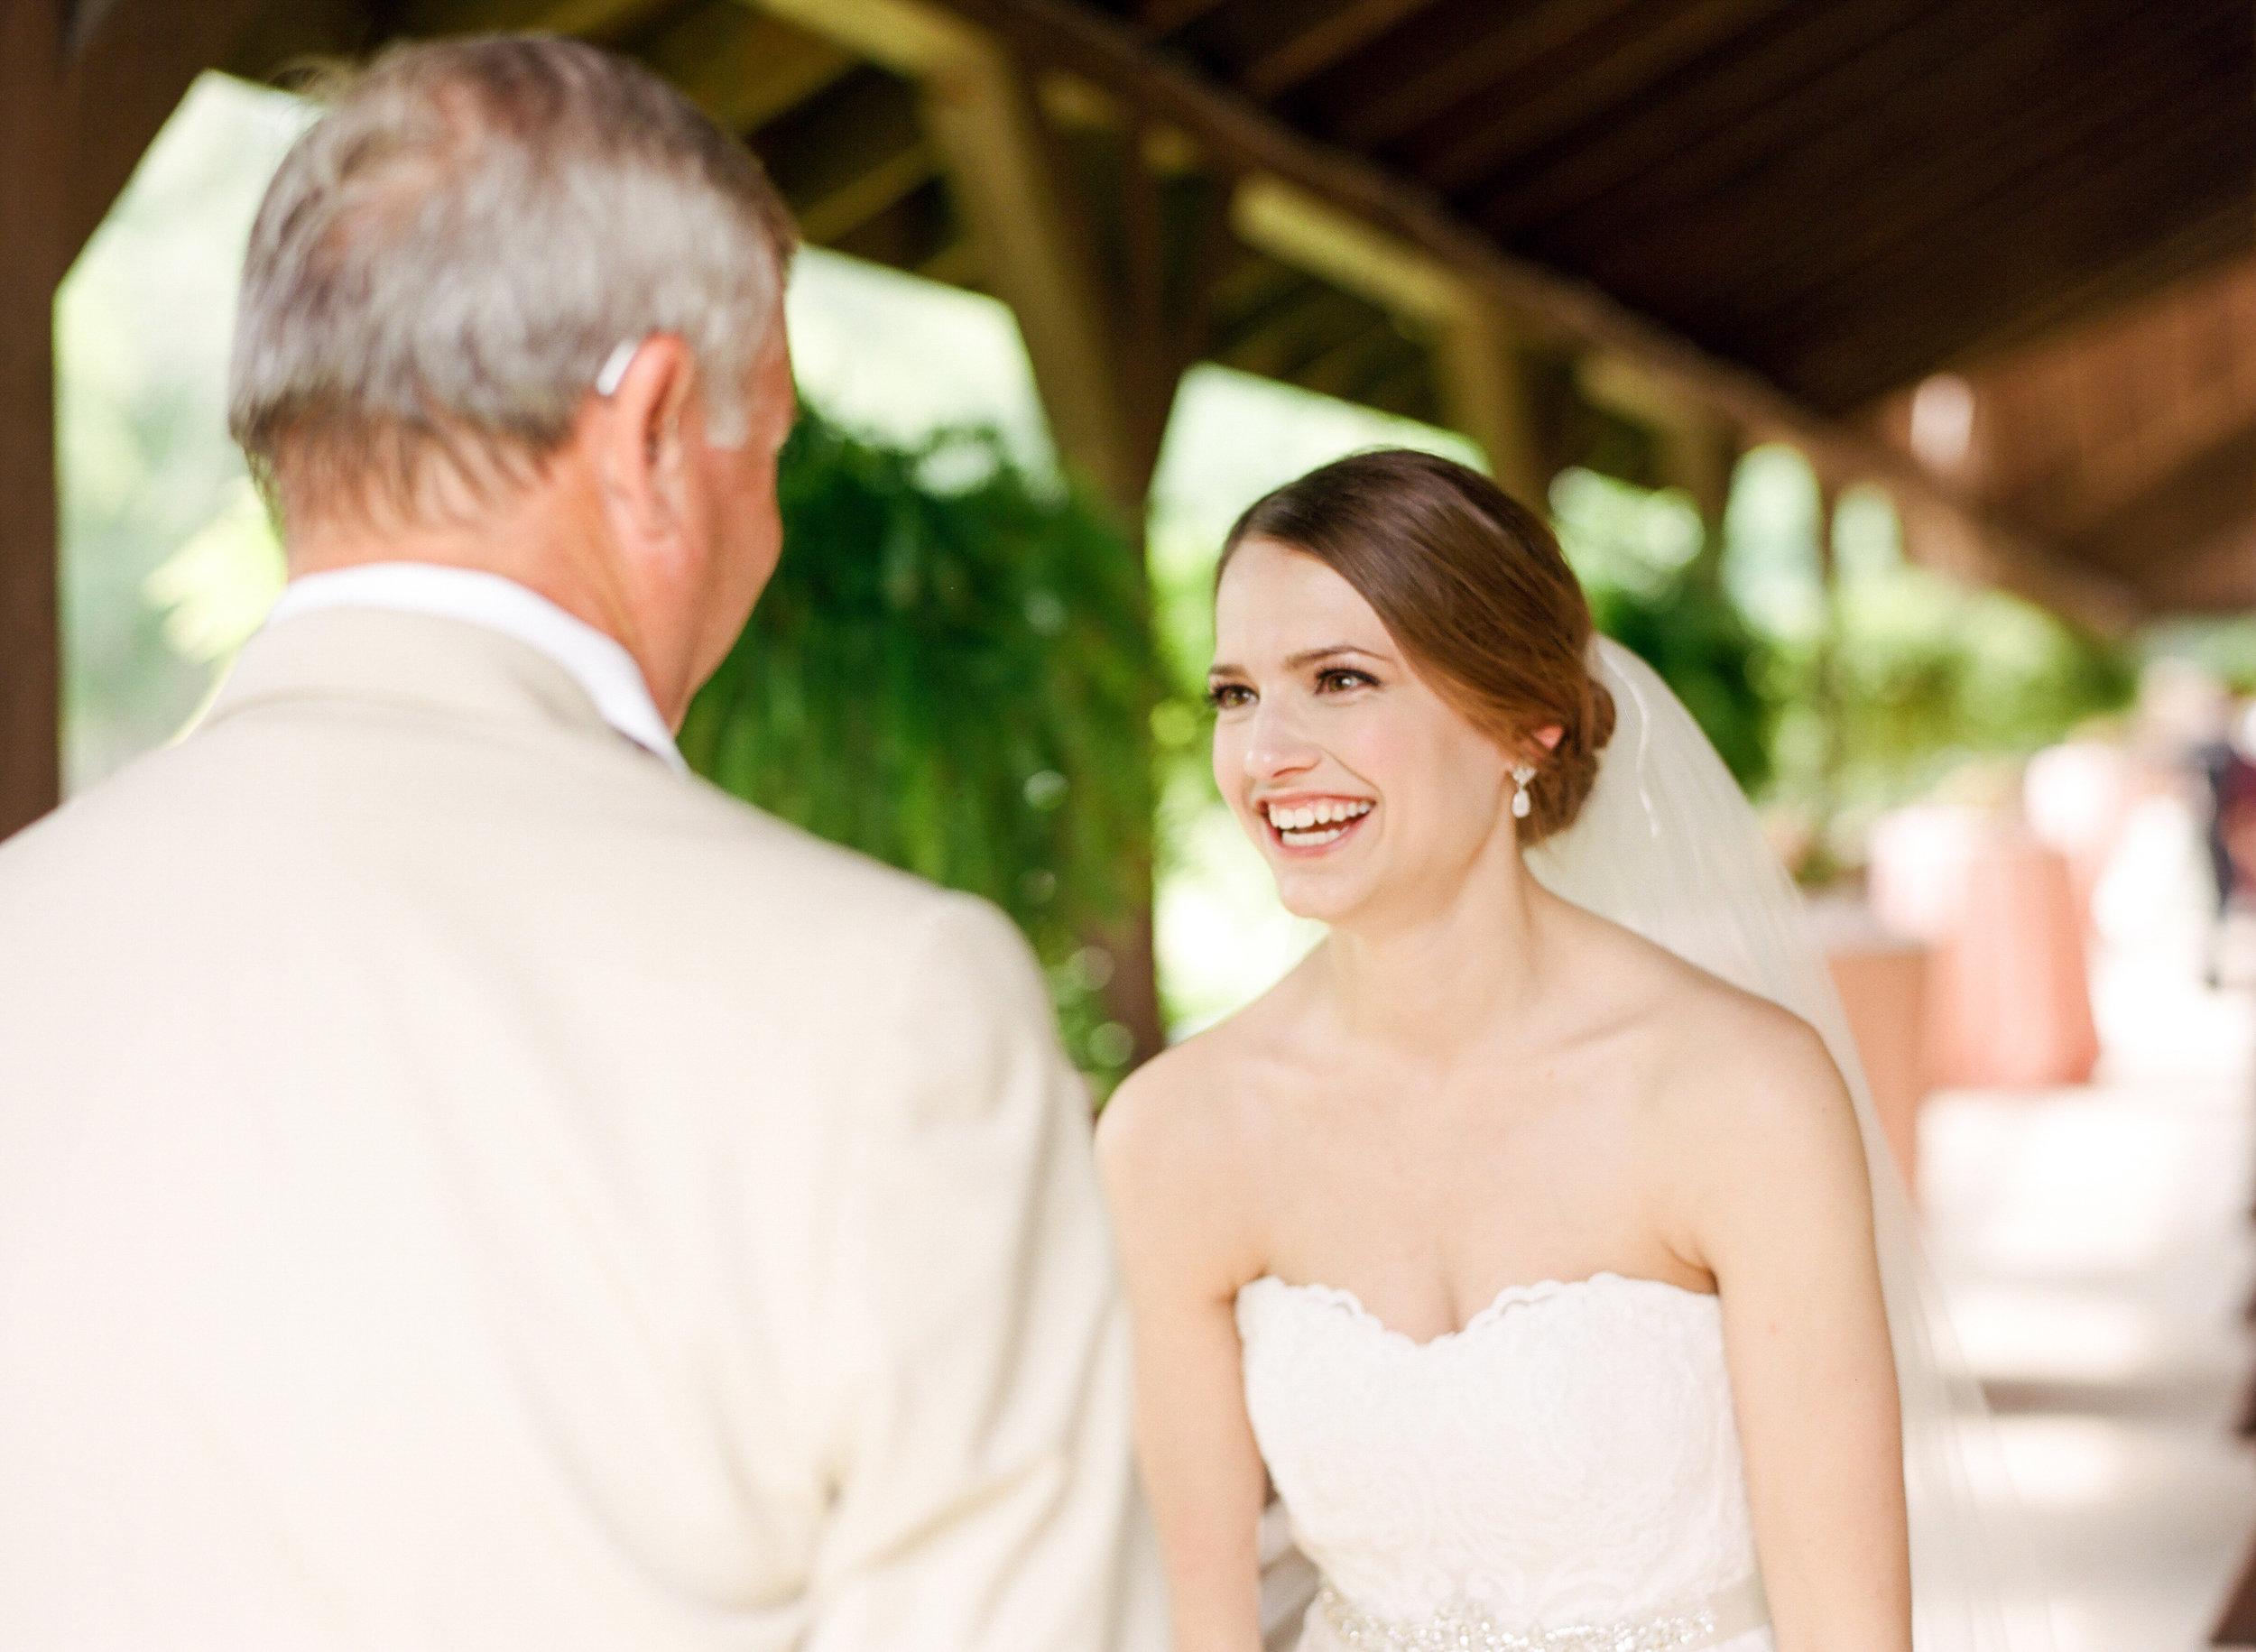 The-Knot-Wedding-Houston-Photographer-Fine-Art-Dana-Fernandez-Photography-Film-203.jpg